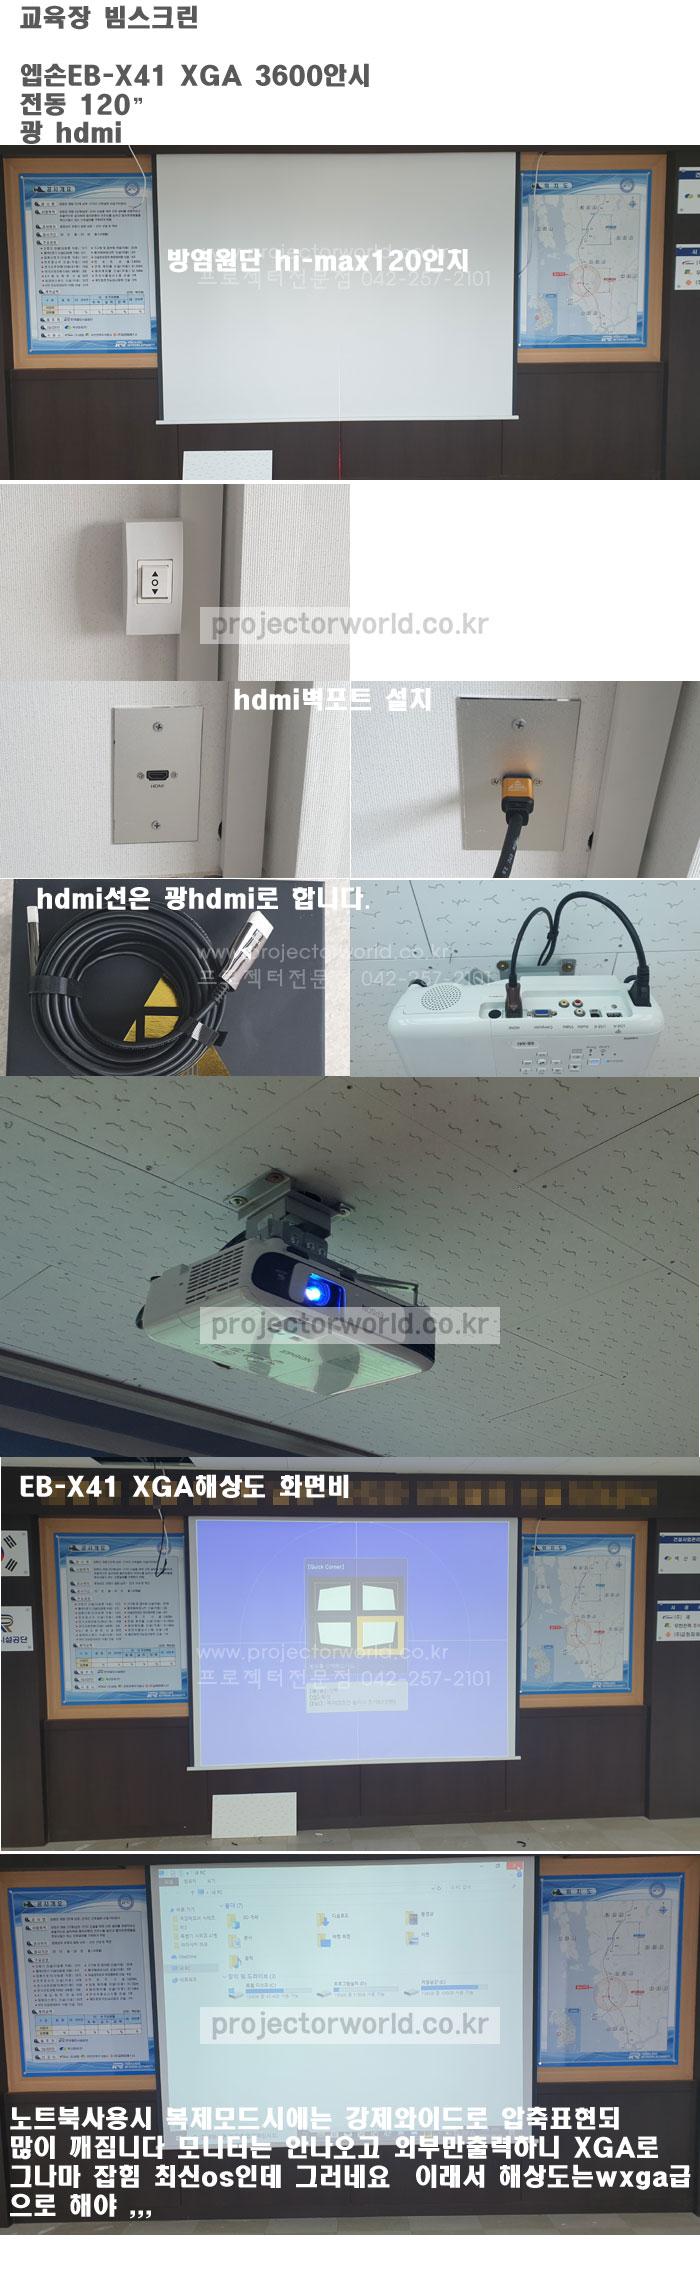 eb-x41,보령빔설치,보령프로젝터,대전프로젝터설치,